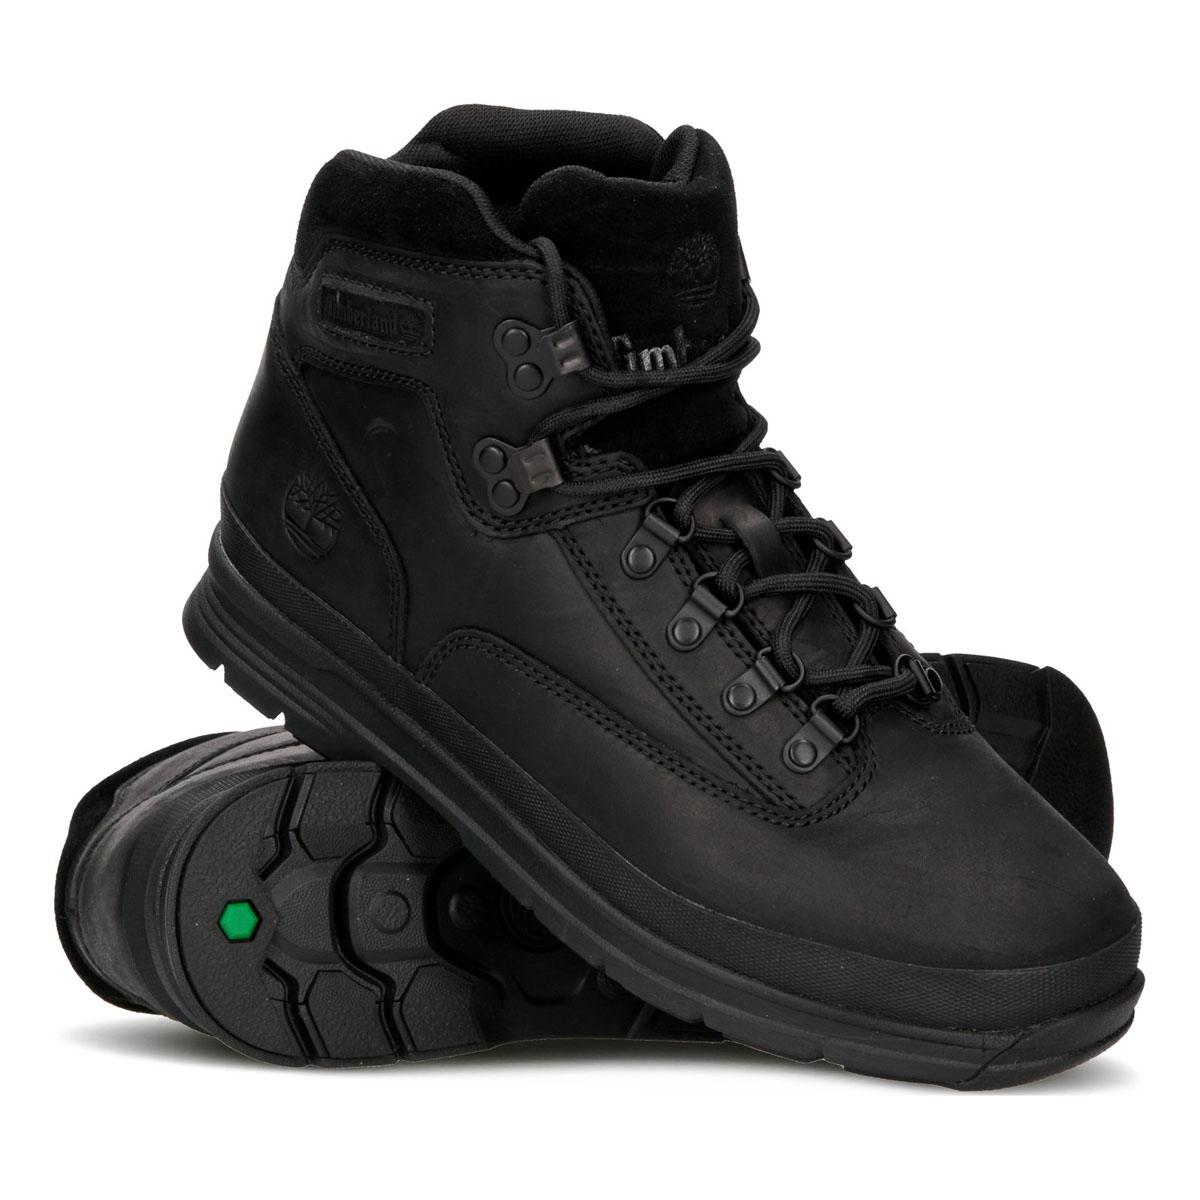 5ac038d3e4e4 ... Image of Timberland Euro Hiker SF Leather (Men s) - Black Full Grain  Leather ...